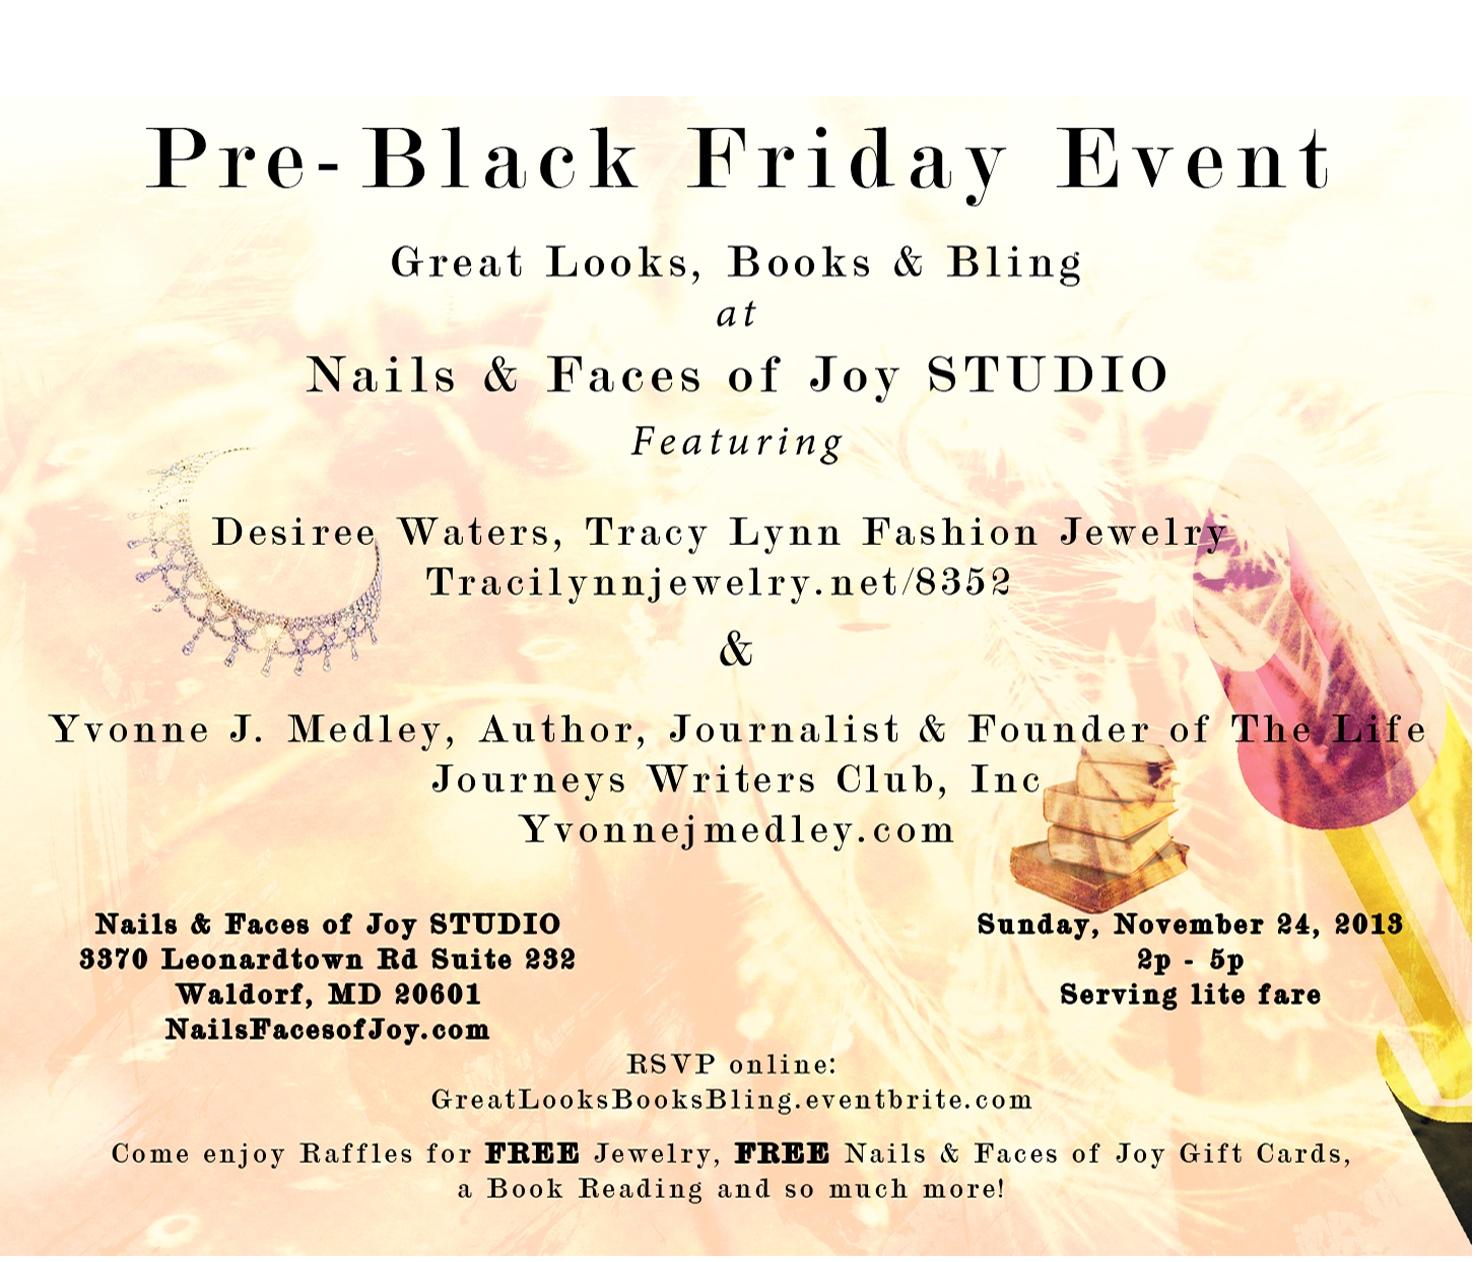 PreBlackFriday Event